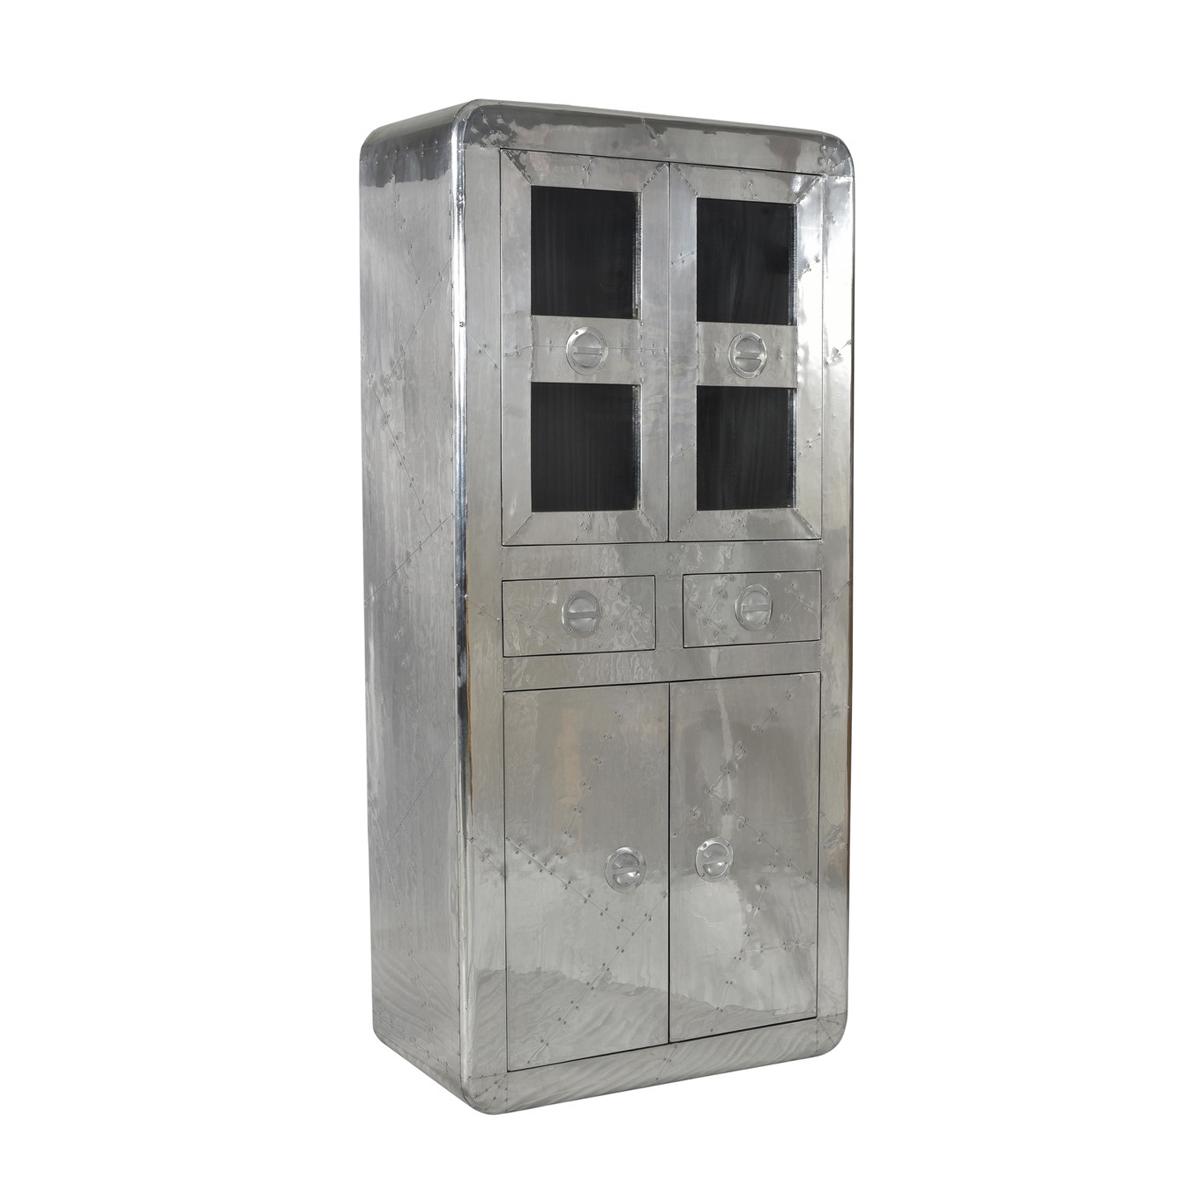 Aluminium vitrinekast met 2 laden